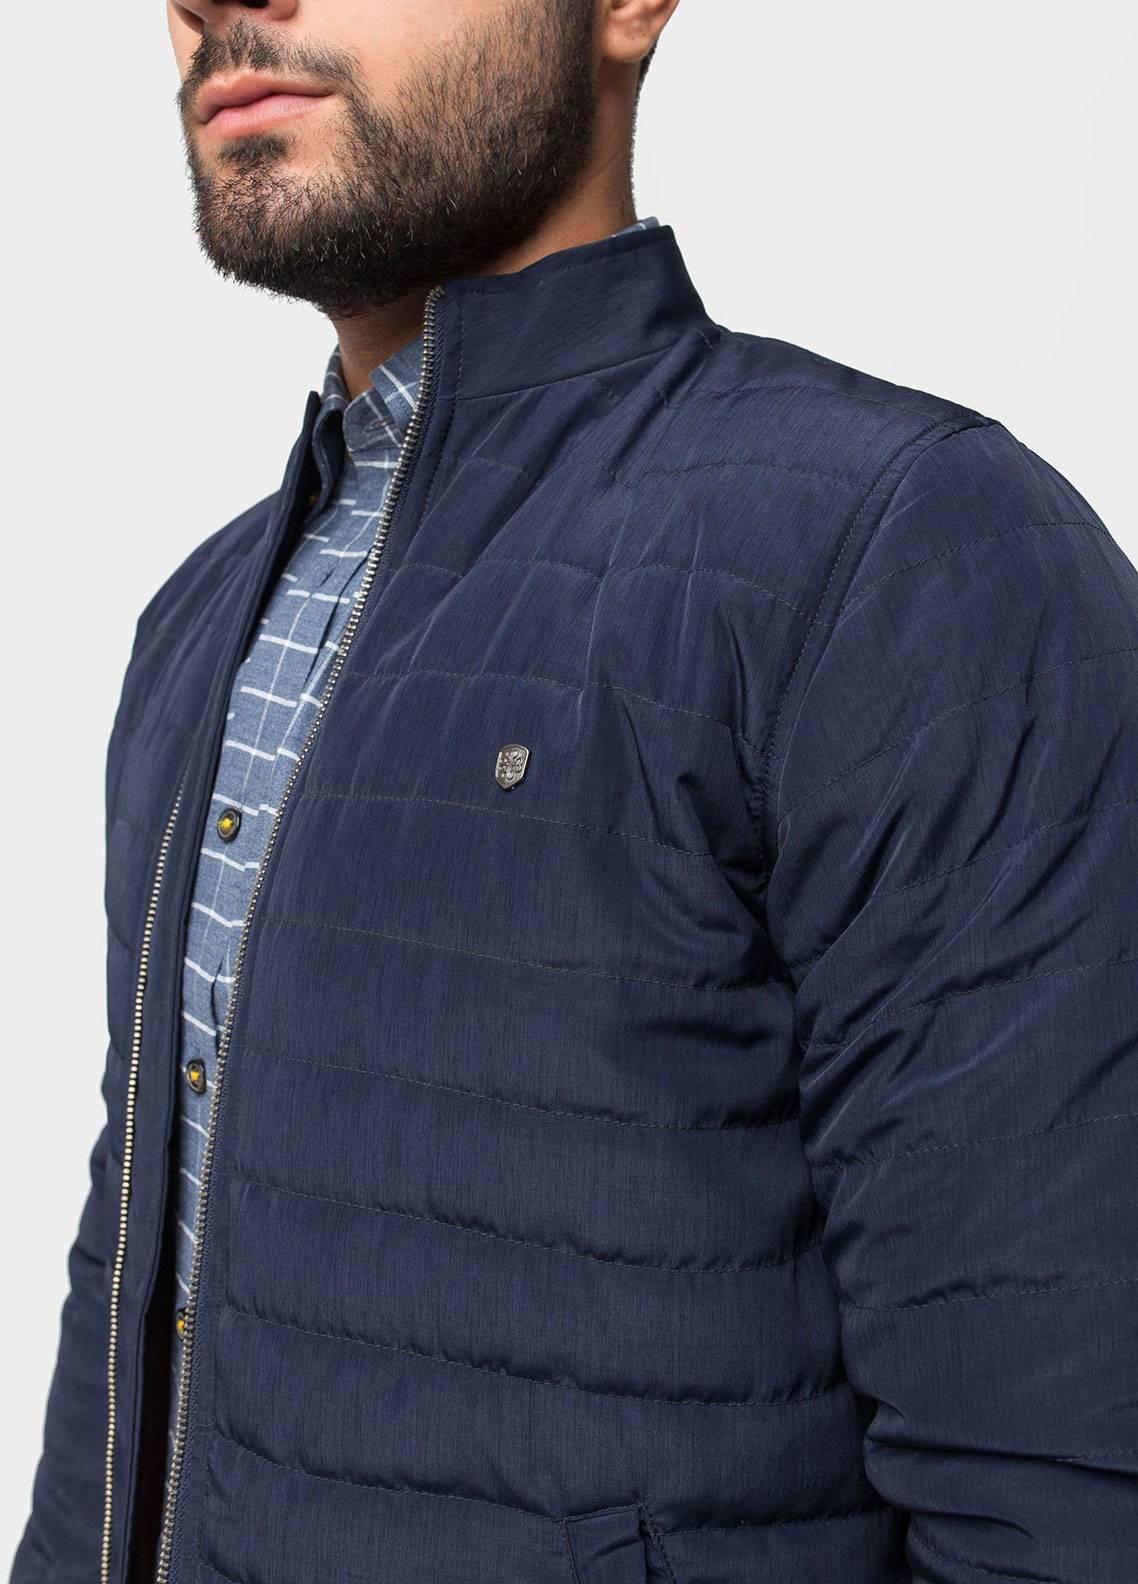 Brumano Polyester Full Sleeves Jackets for Men - Blue BRM-11-1003